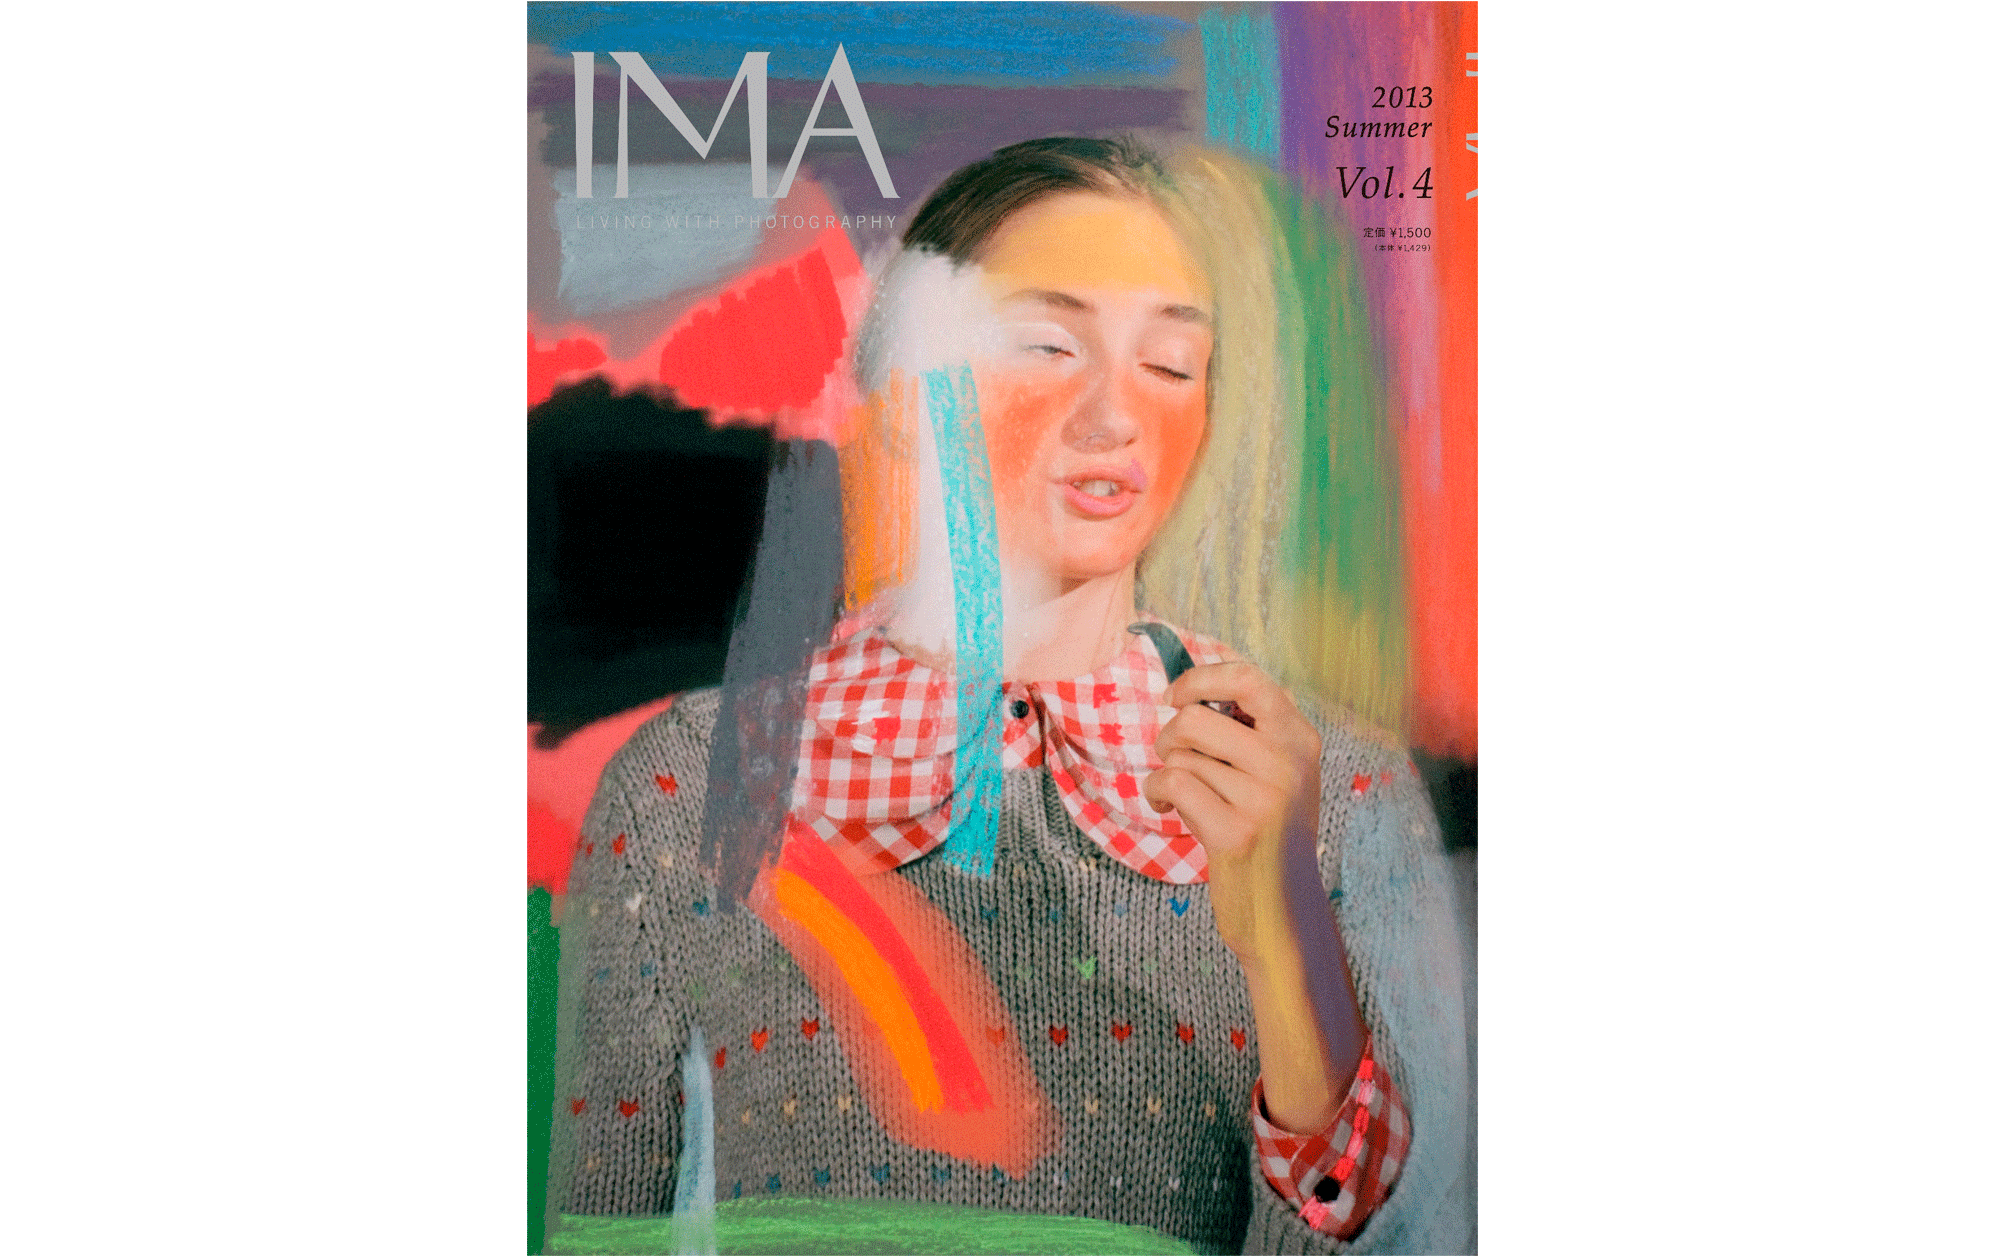 IMA 2013 Summer Vol.4